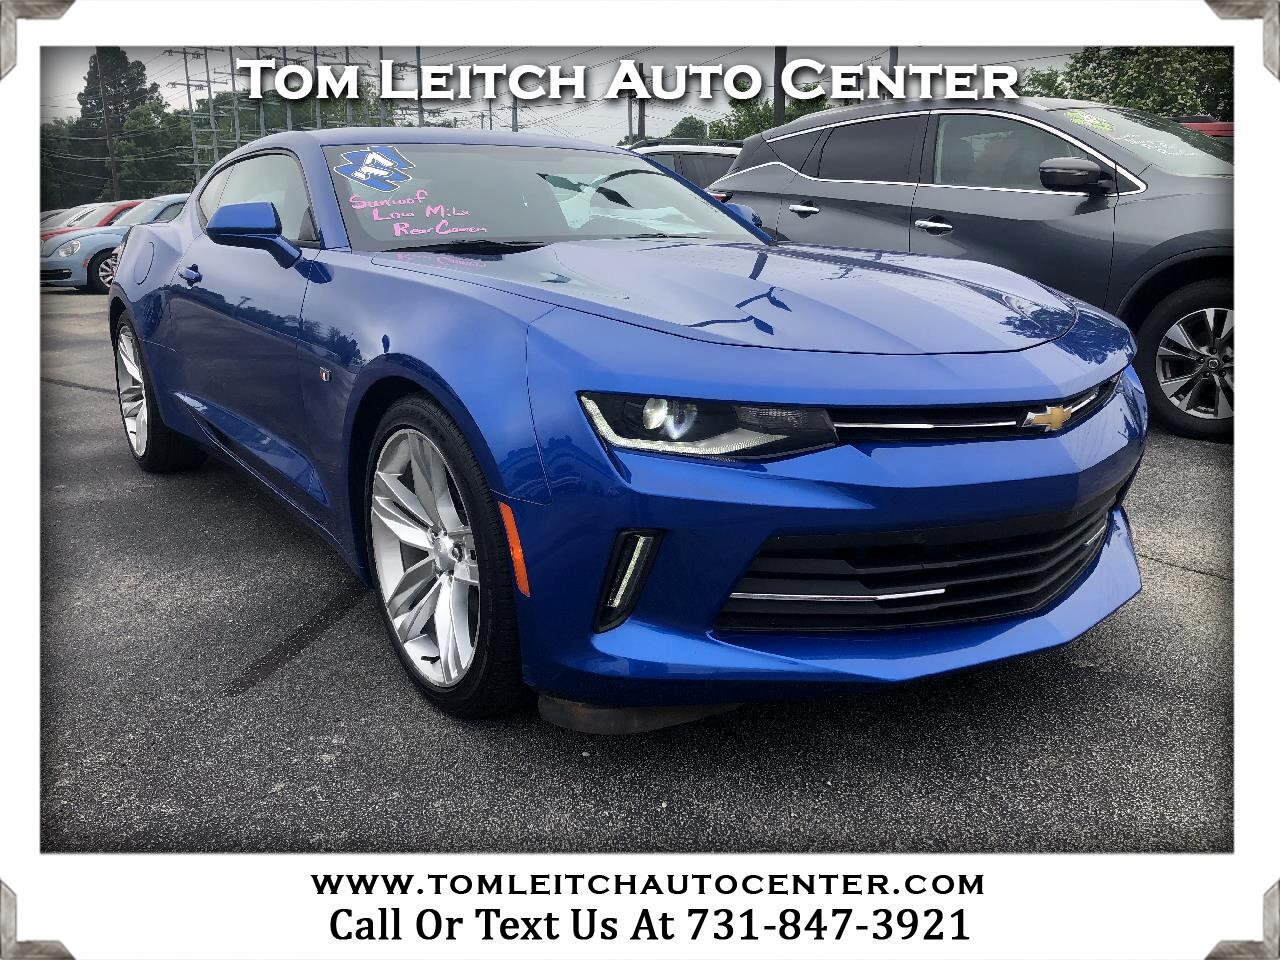 2017 Chevrolet Camaro 2dr Cpe LT w/1LT